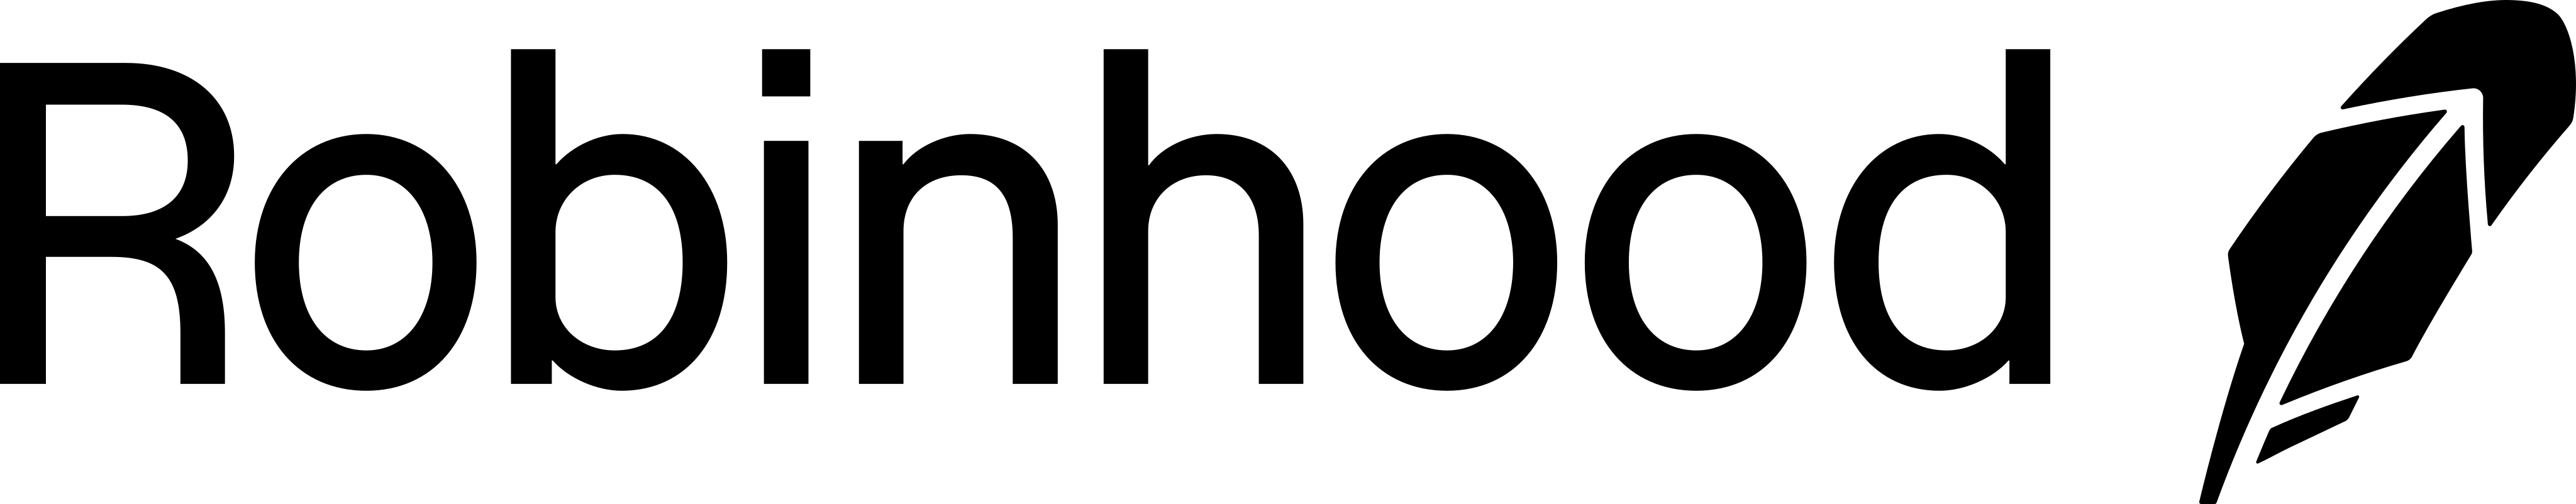 robinhood logo 1 - Robinhood Logo